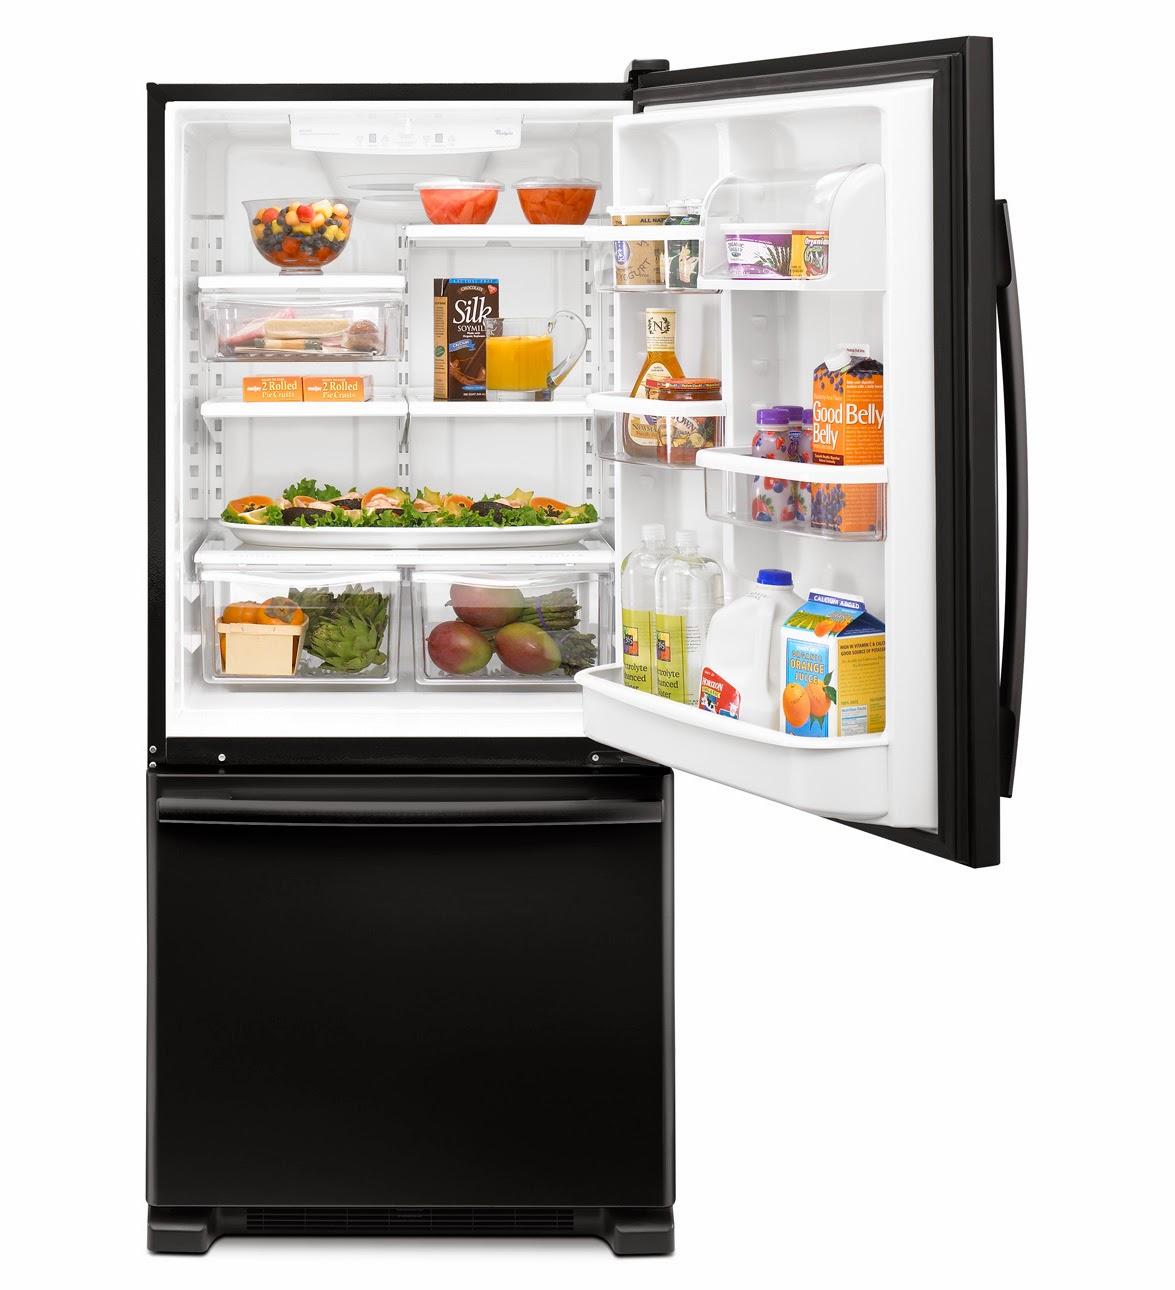 Whirlpool Refrigerator Brand Gold Gb9fhdxwb Bottom